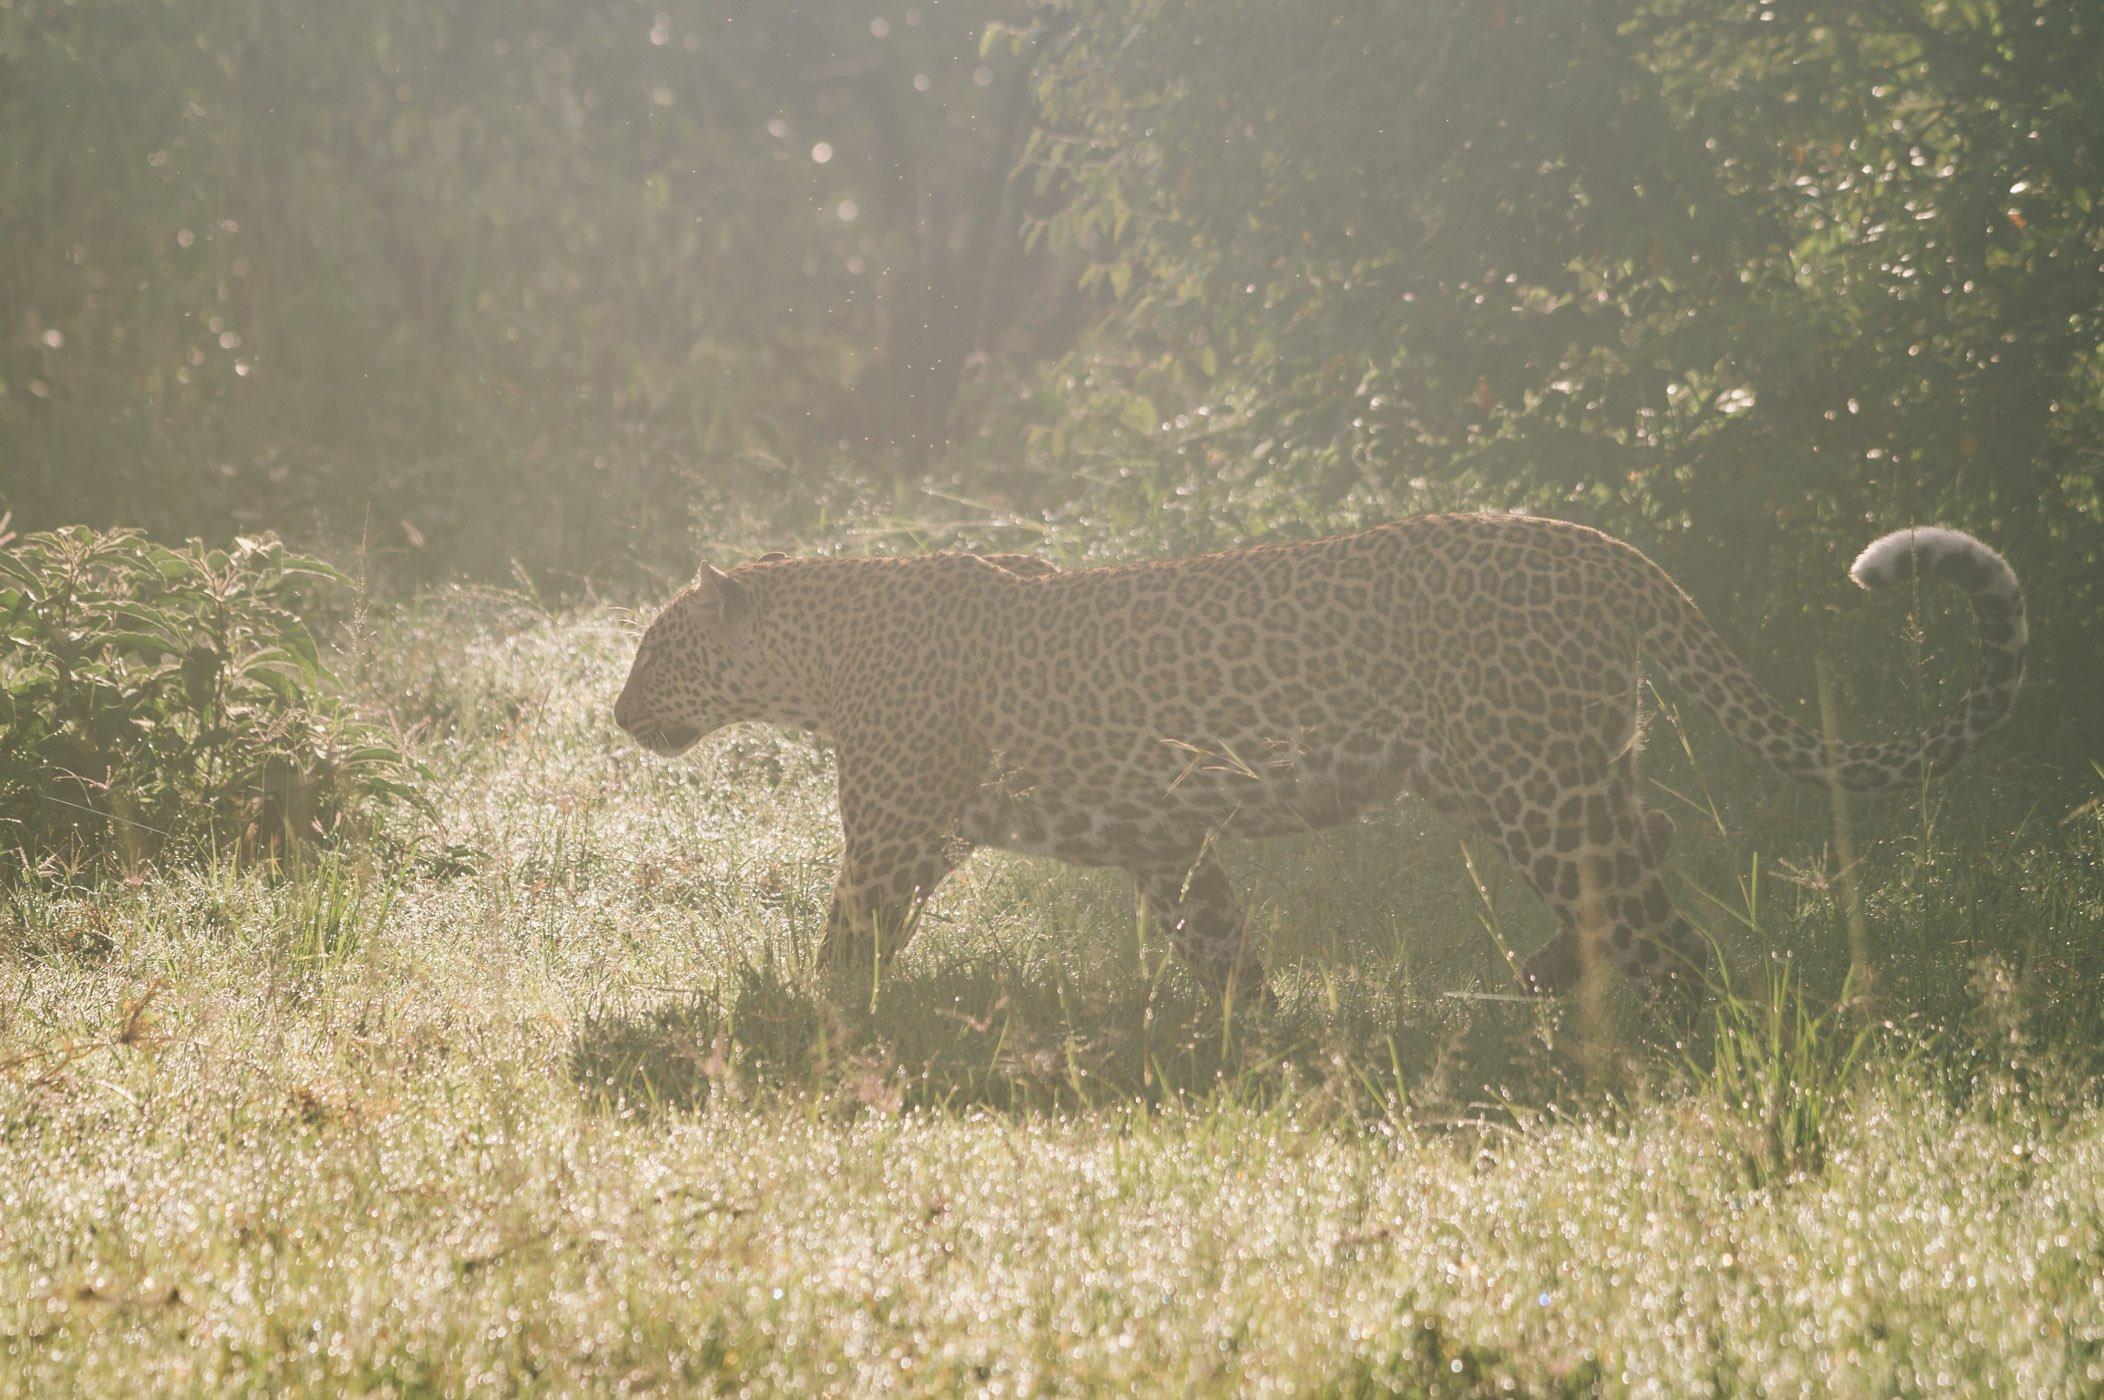 Leopard Bella in the Maasai Mara in Kenya